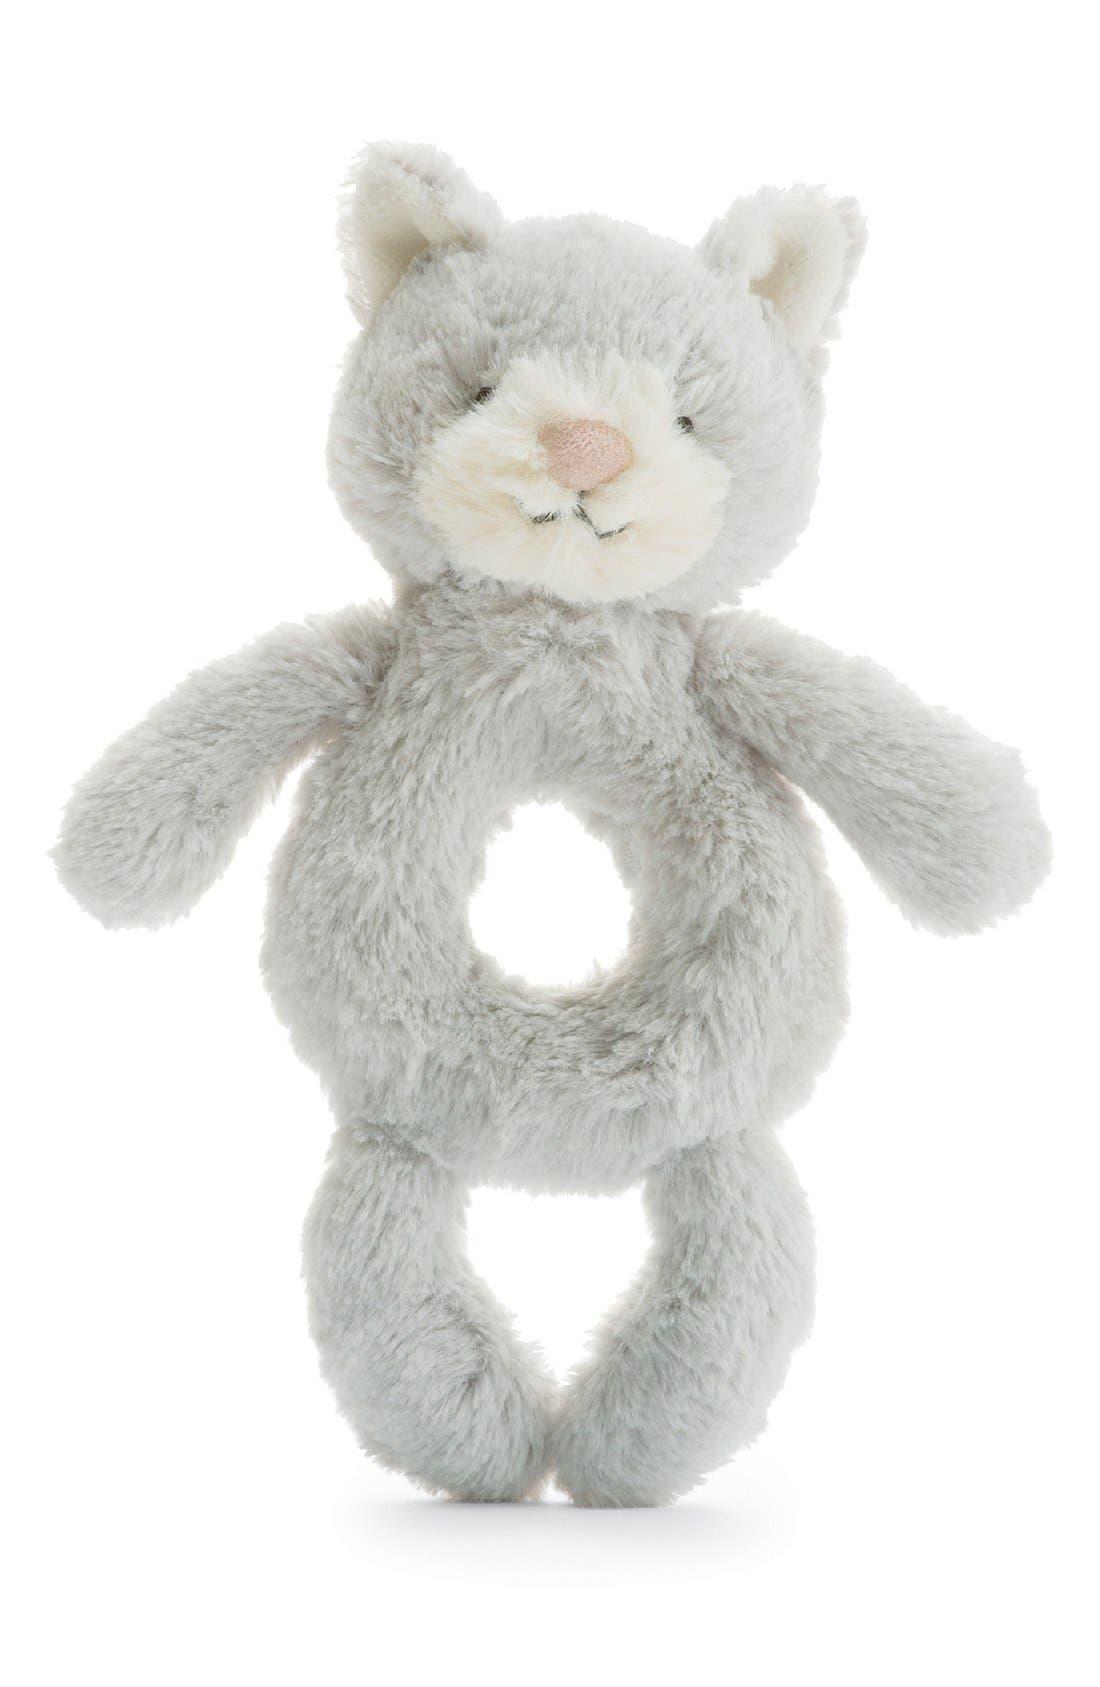 Jellycat 'Kitty' Grabber Rattle